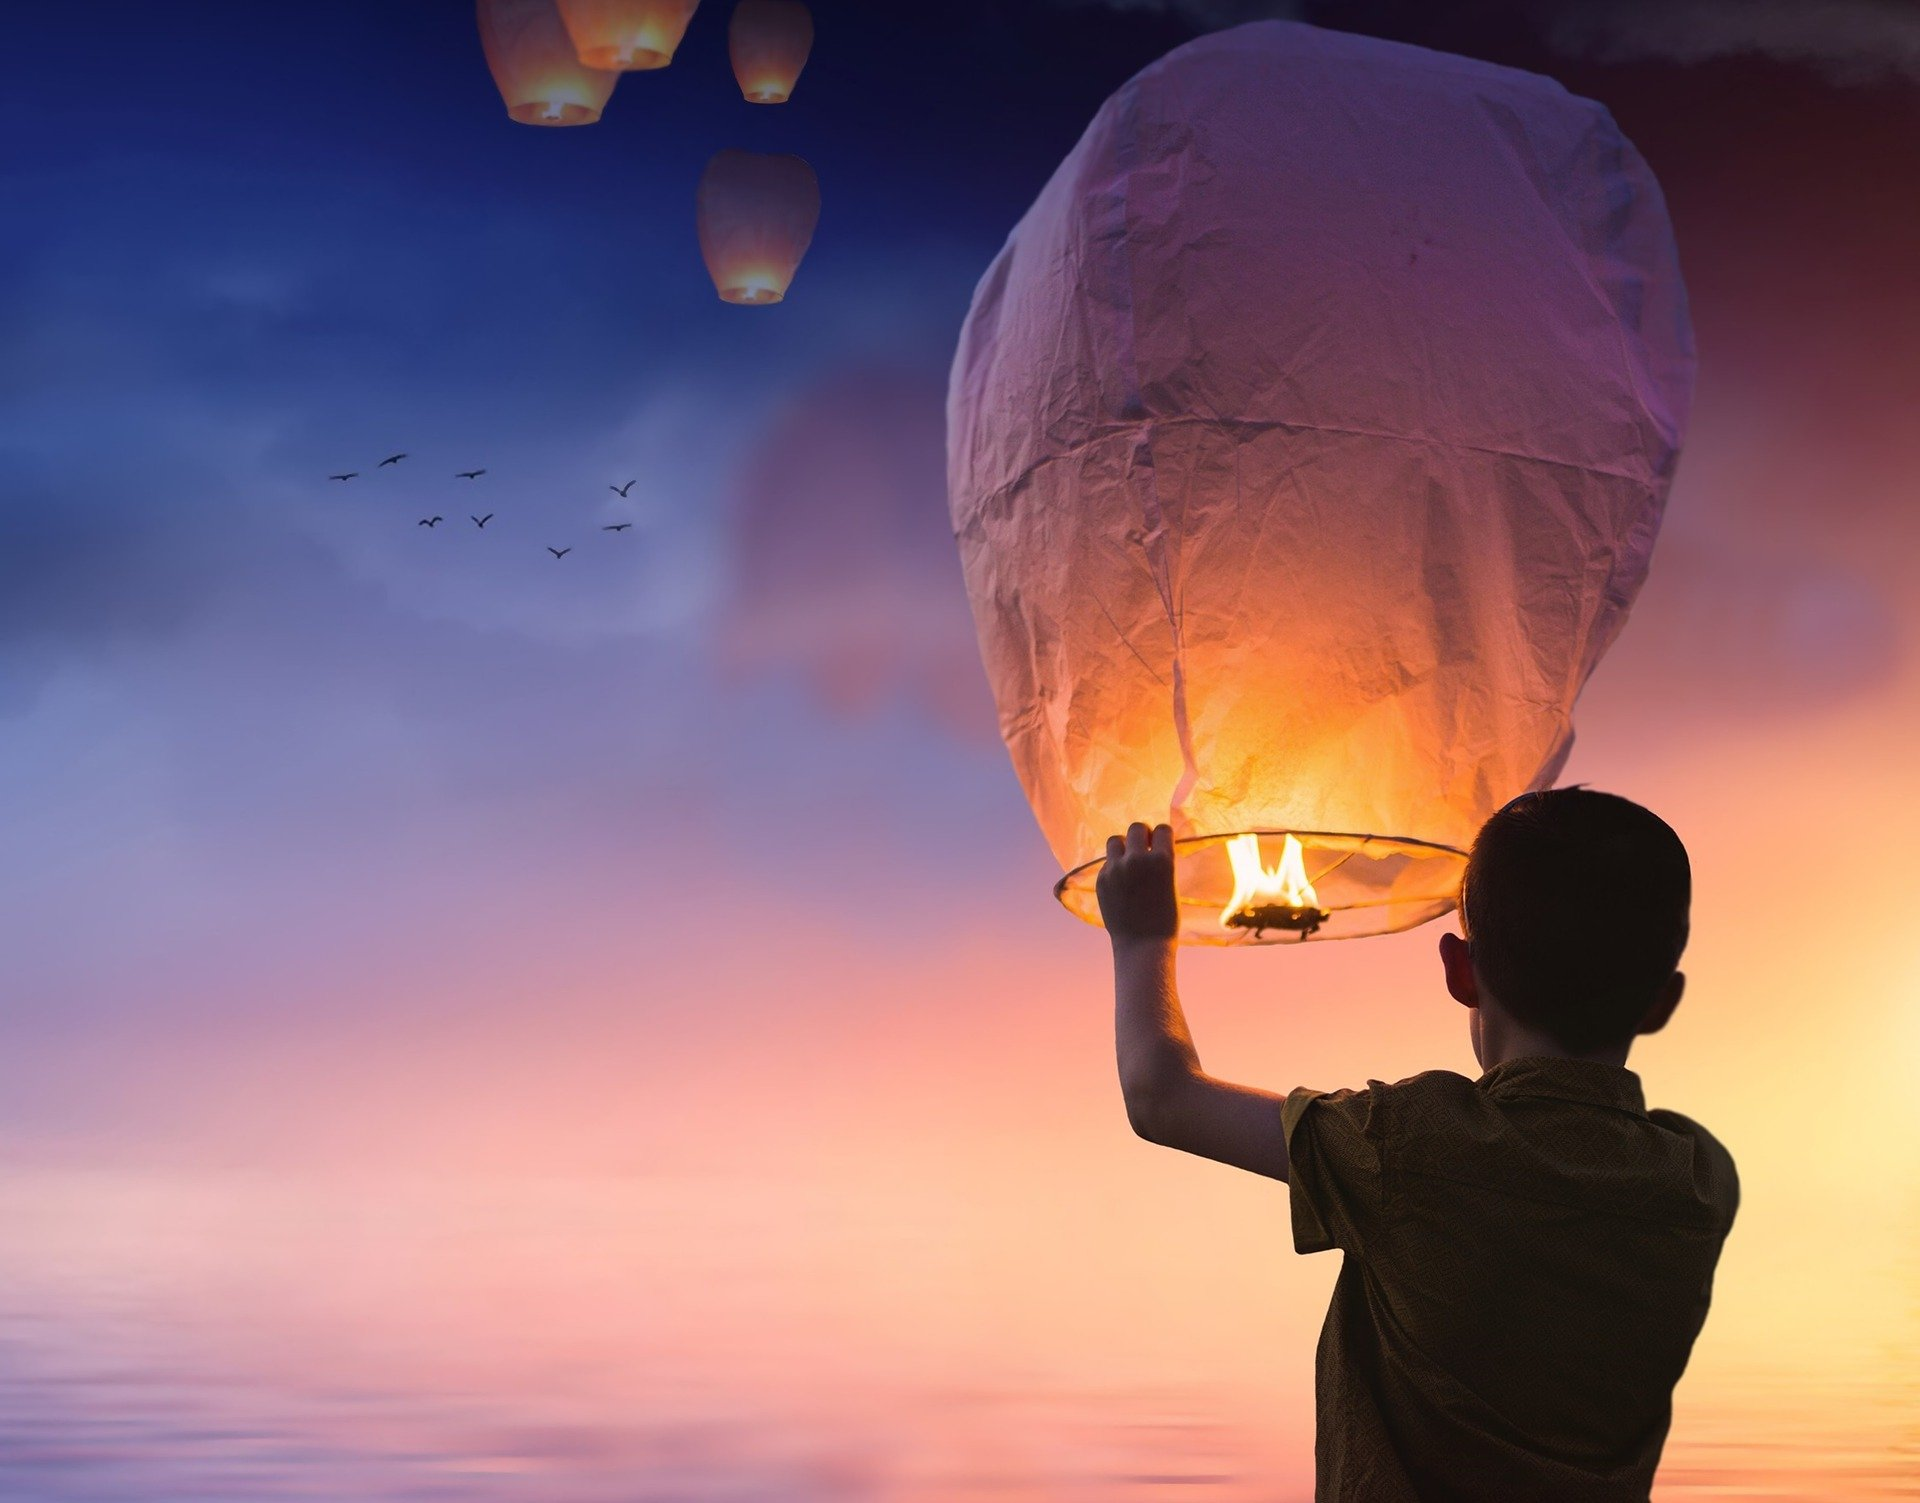 flying lantern, new year blessing